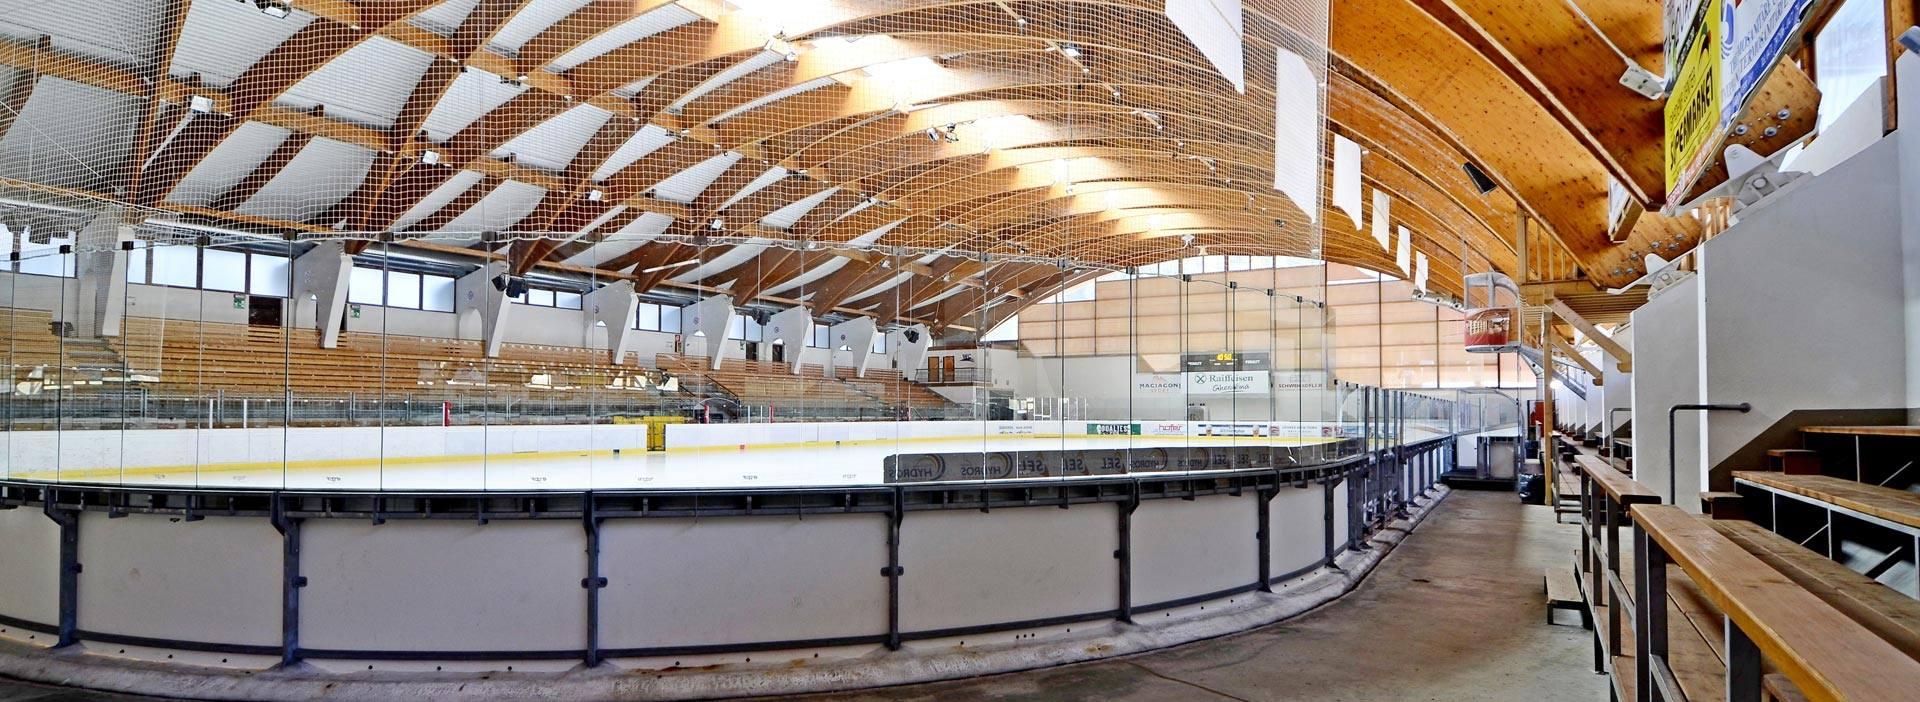 Eisstadion Pranives